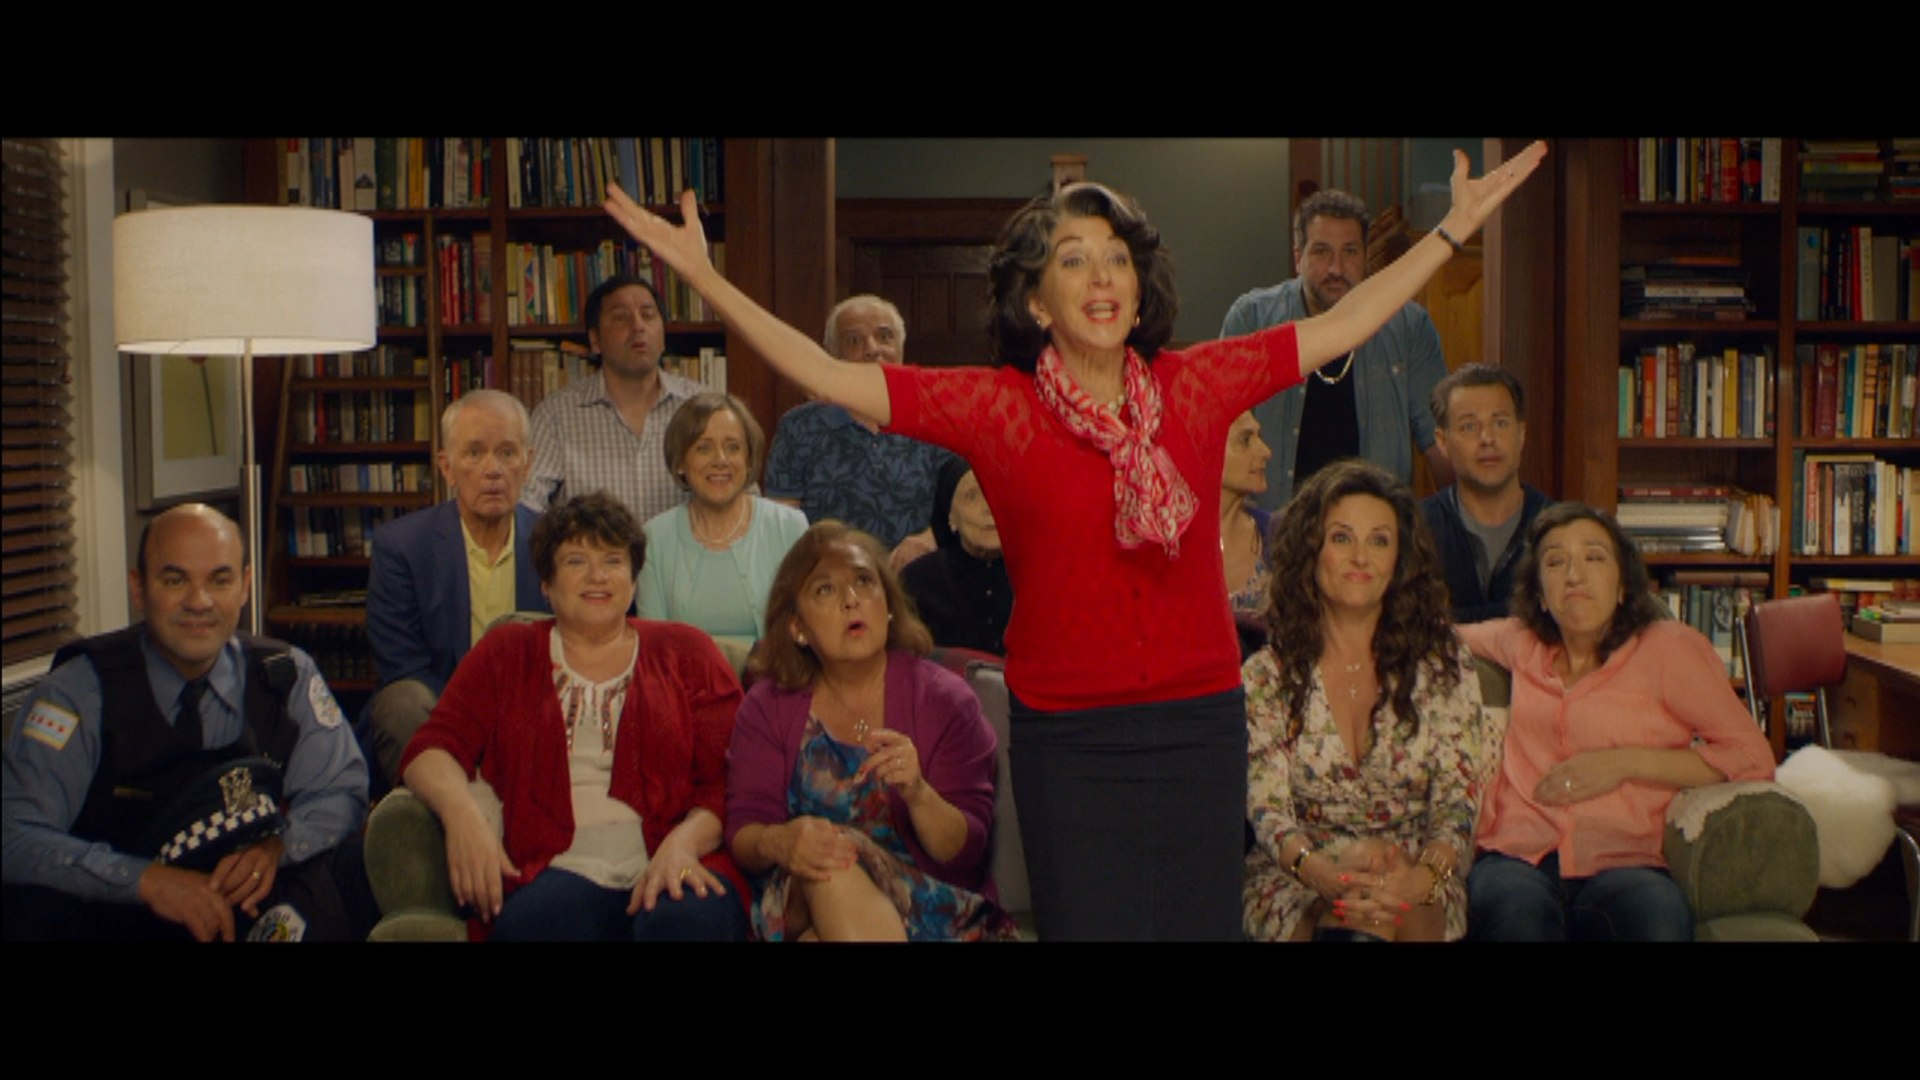 Nia Vardalos, John Corbett In 'My Big Fat Greek Wedding 2' Funny Clip